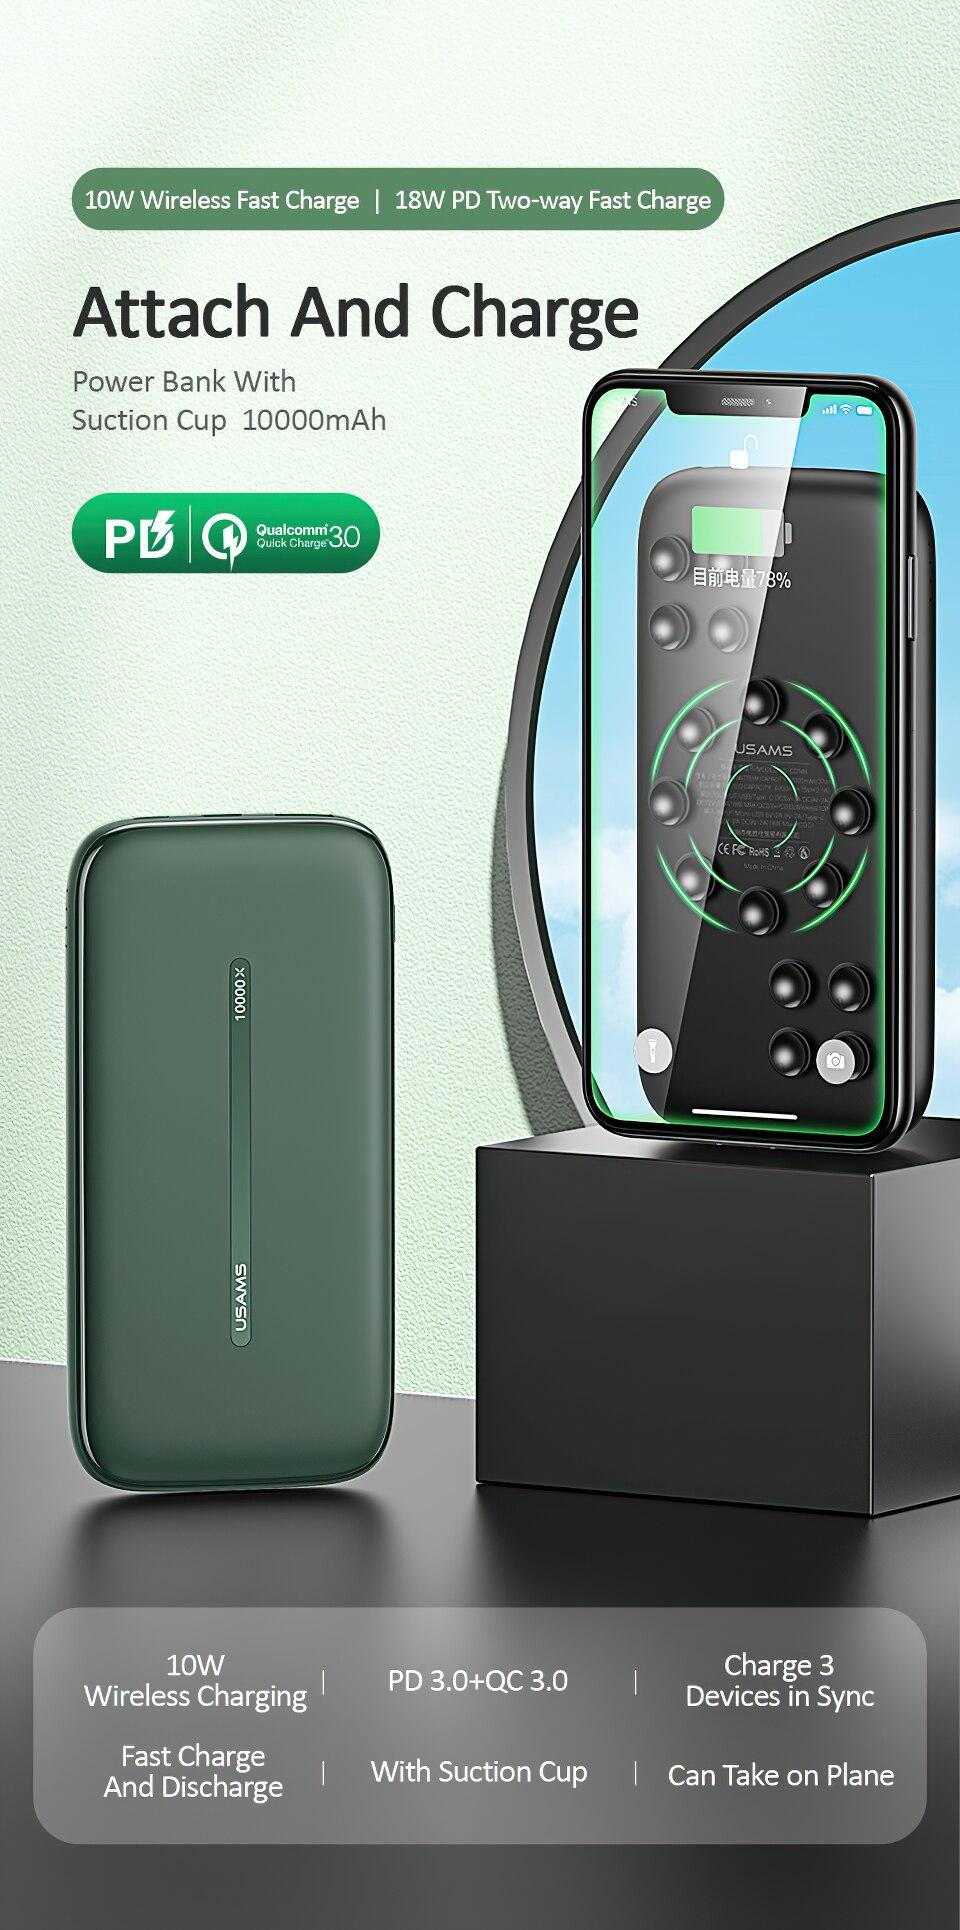 20200717-US-CD146-PB53-QC3.0+PD快充吸盘无线充移动电源-10000mAh_01-width-960px